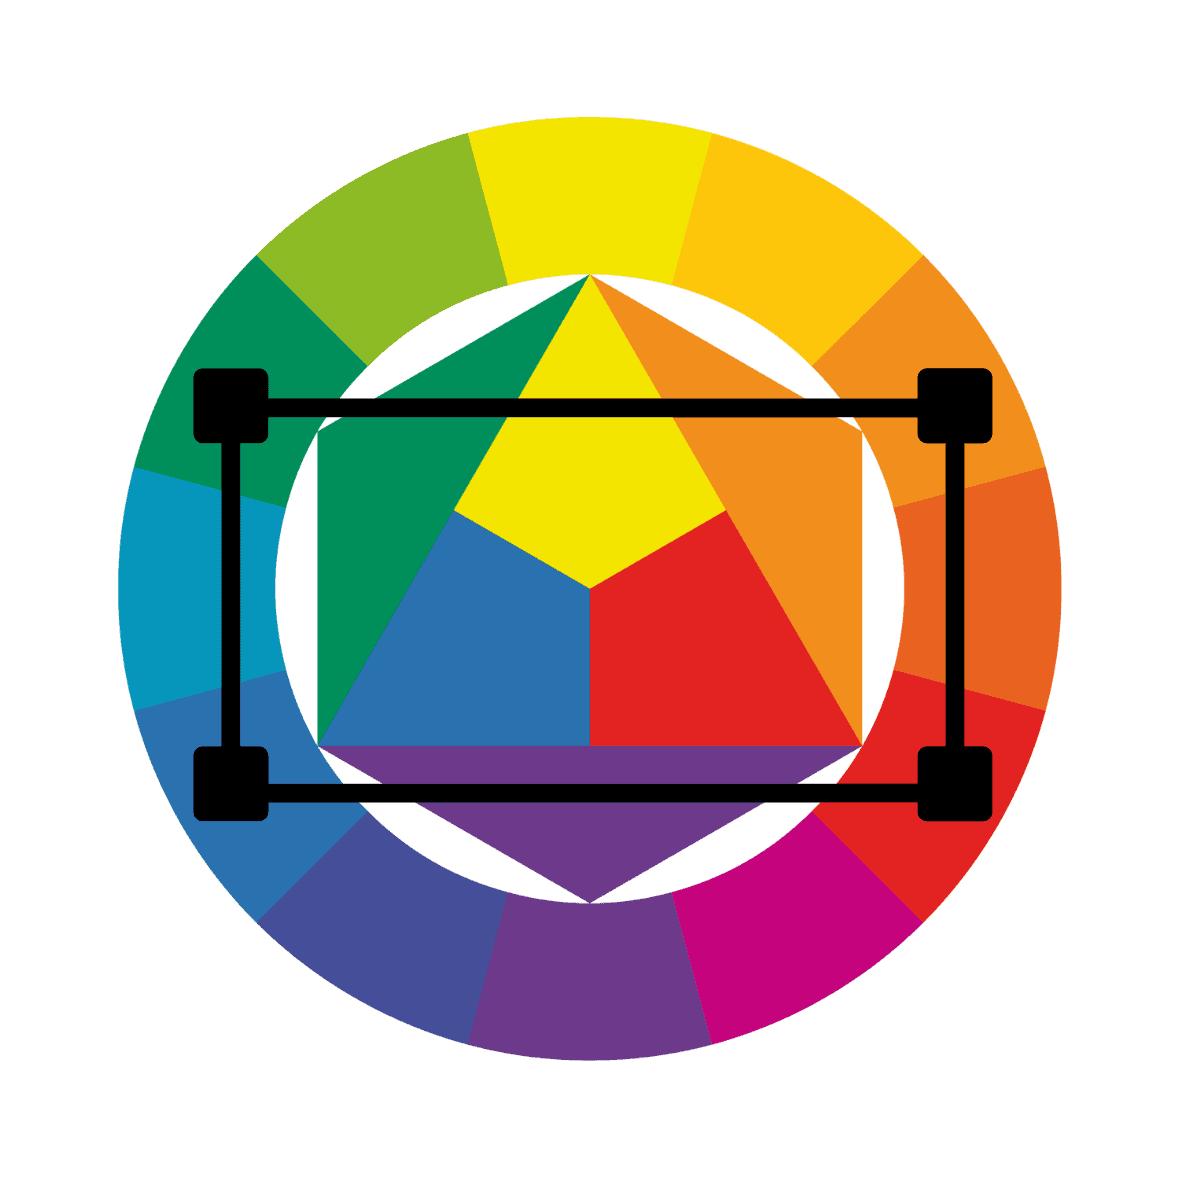 tetradic rectangle color